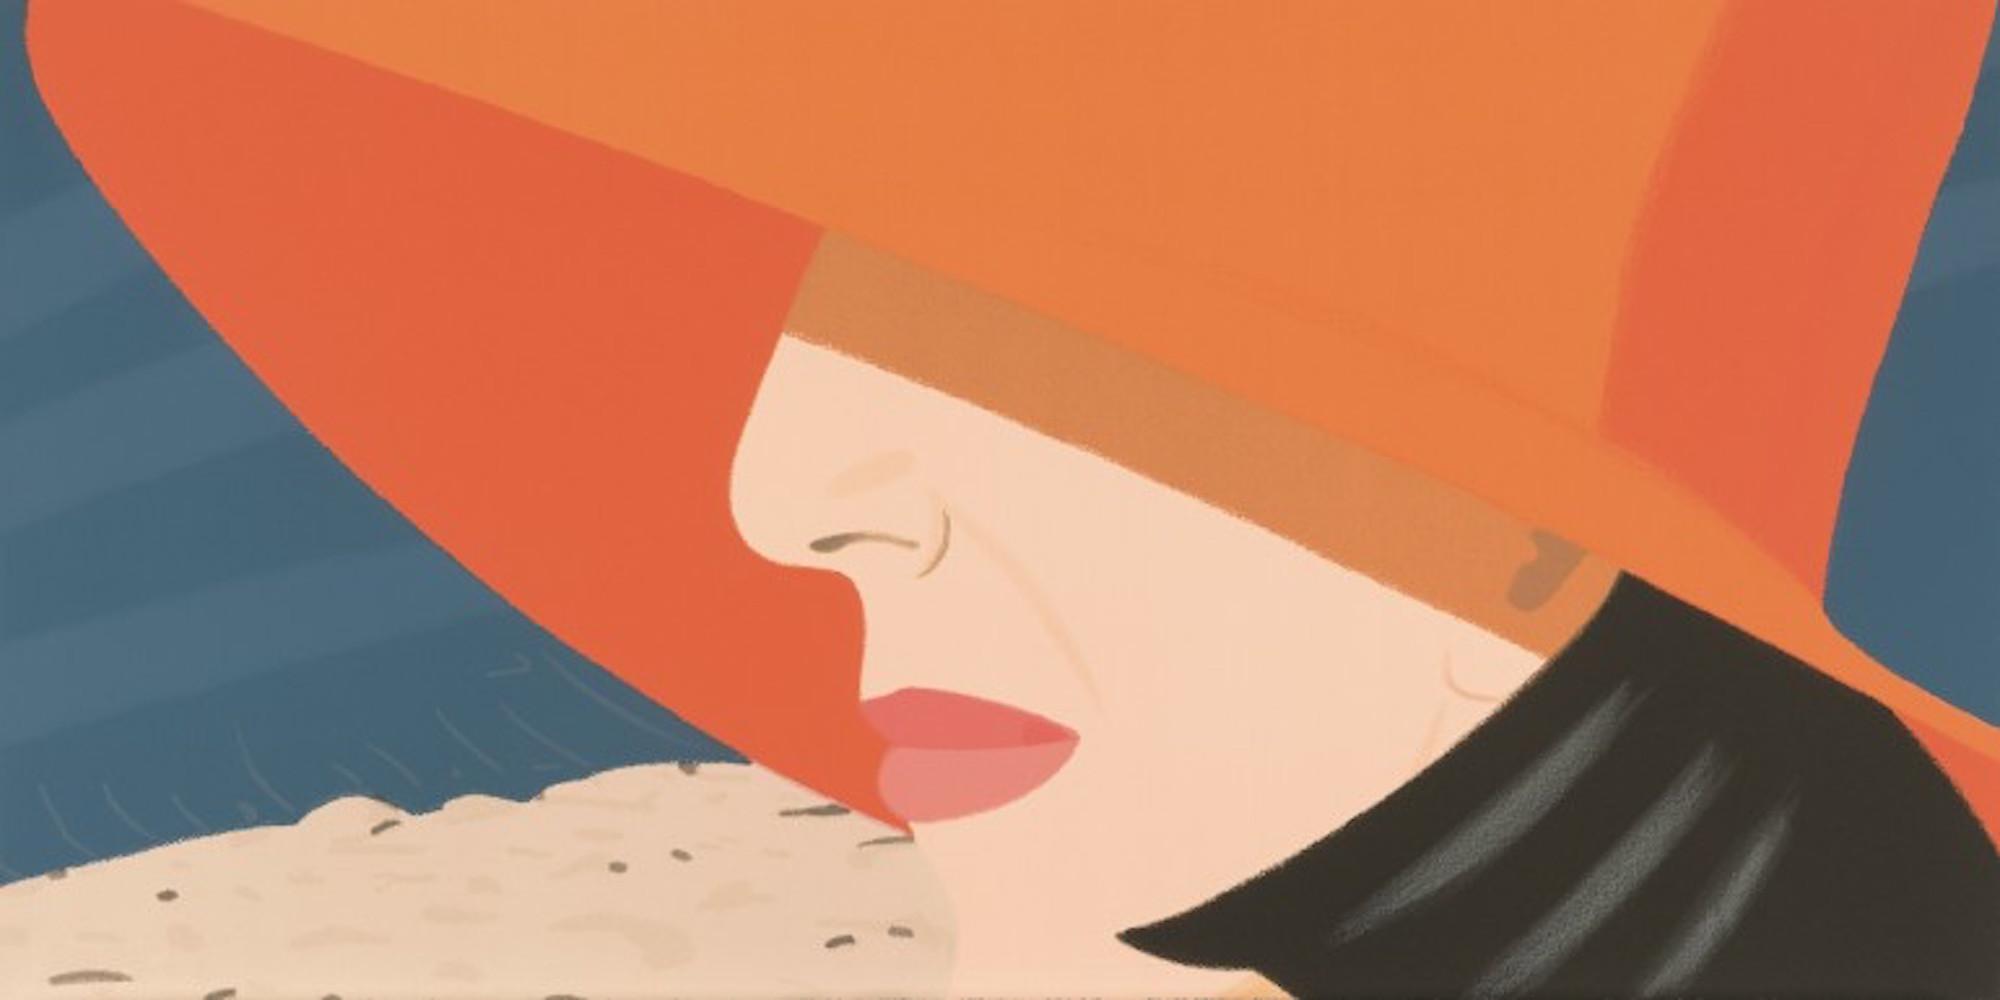 Orange Hat (Alex and Ada Suite) by Alex Katz